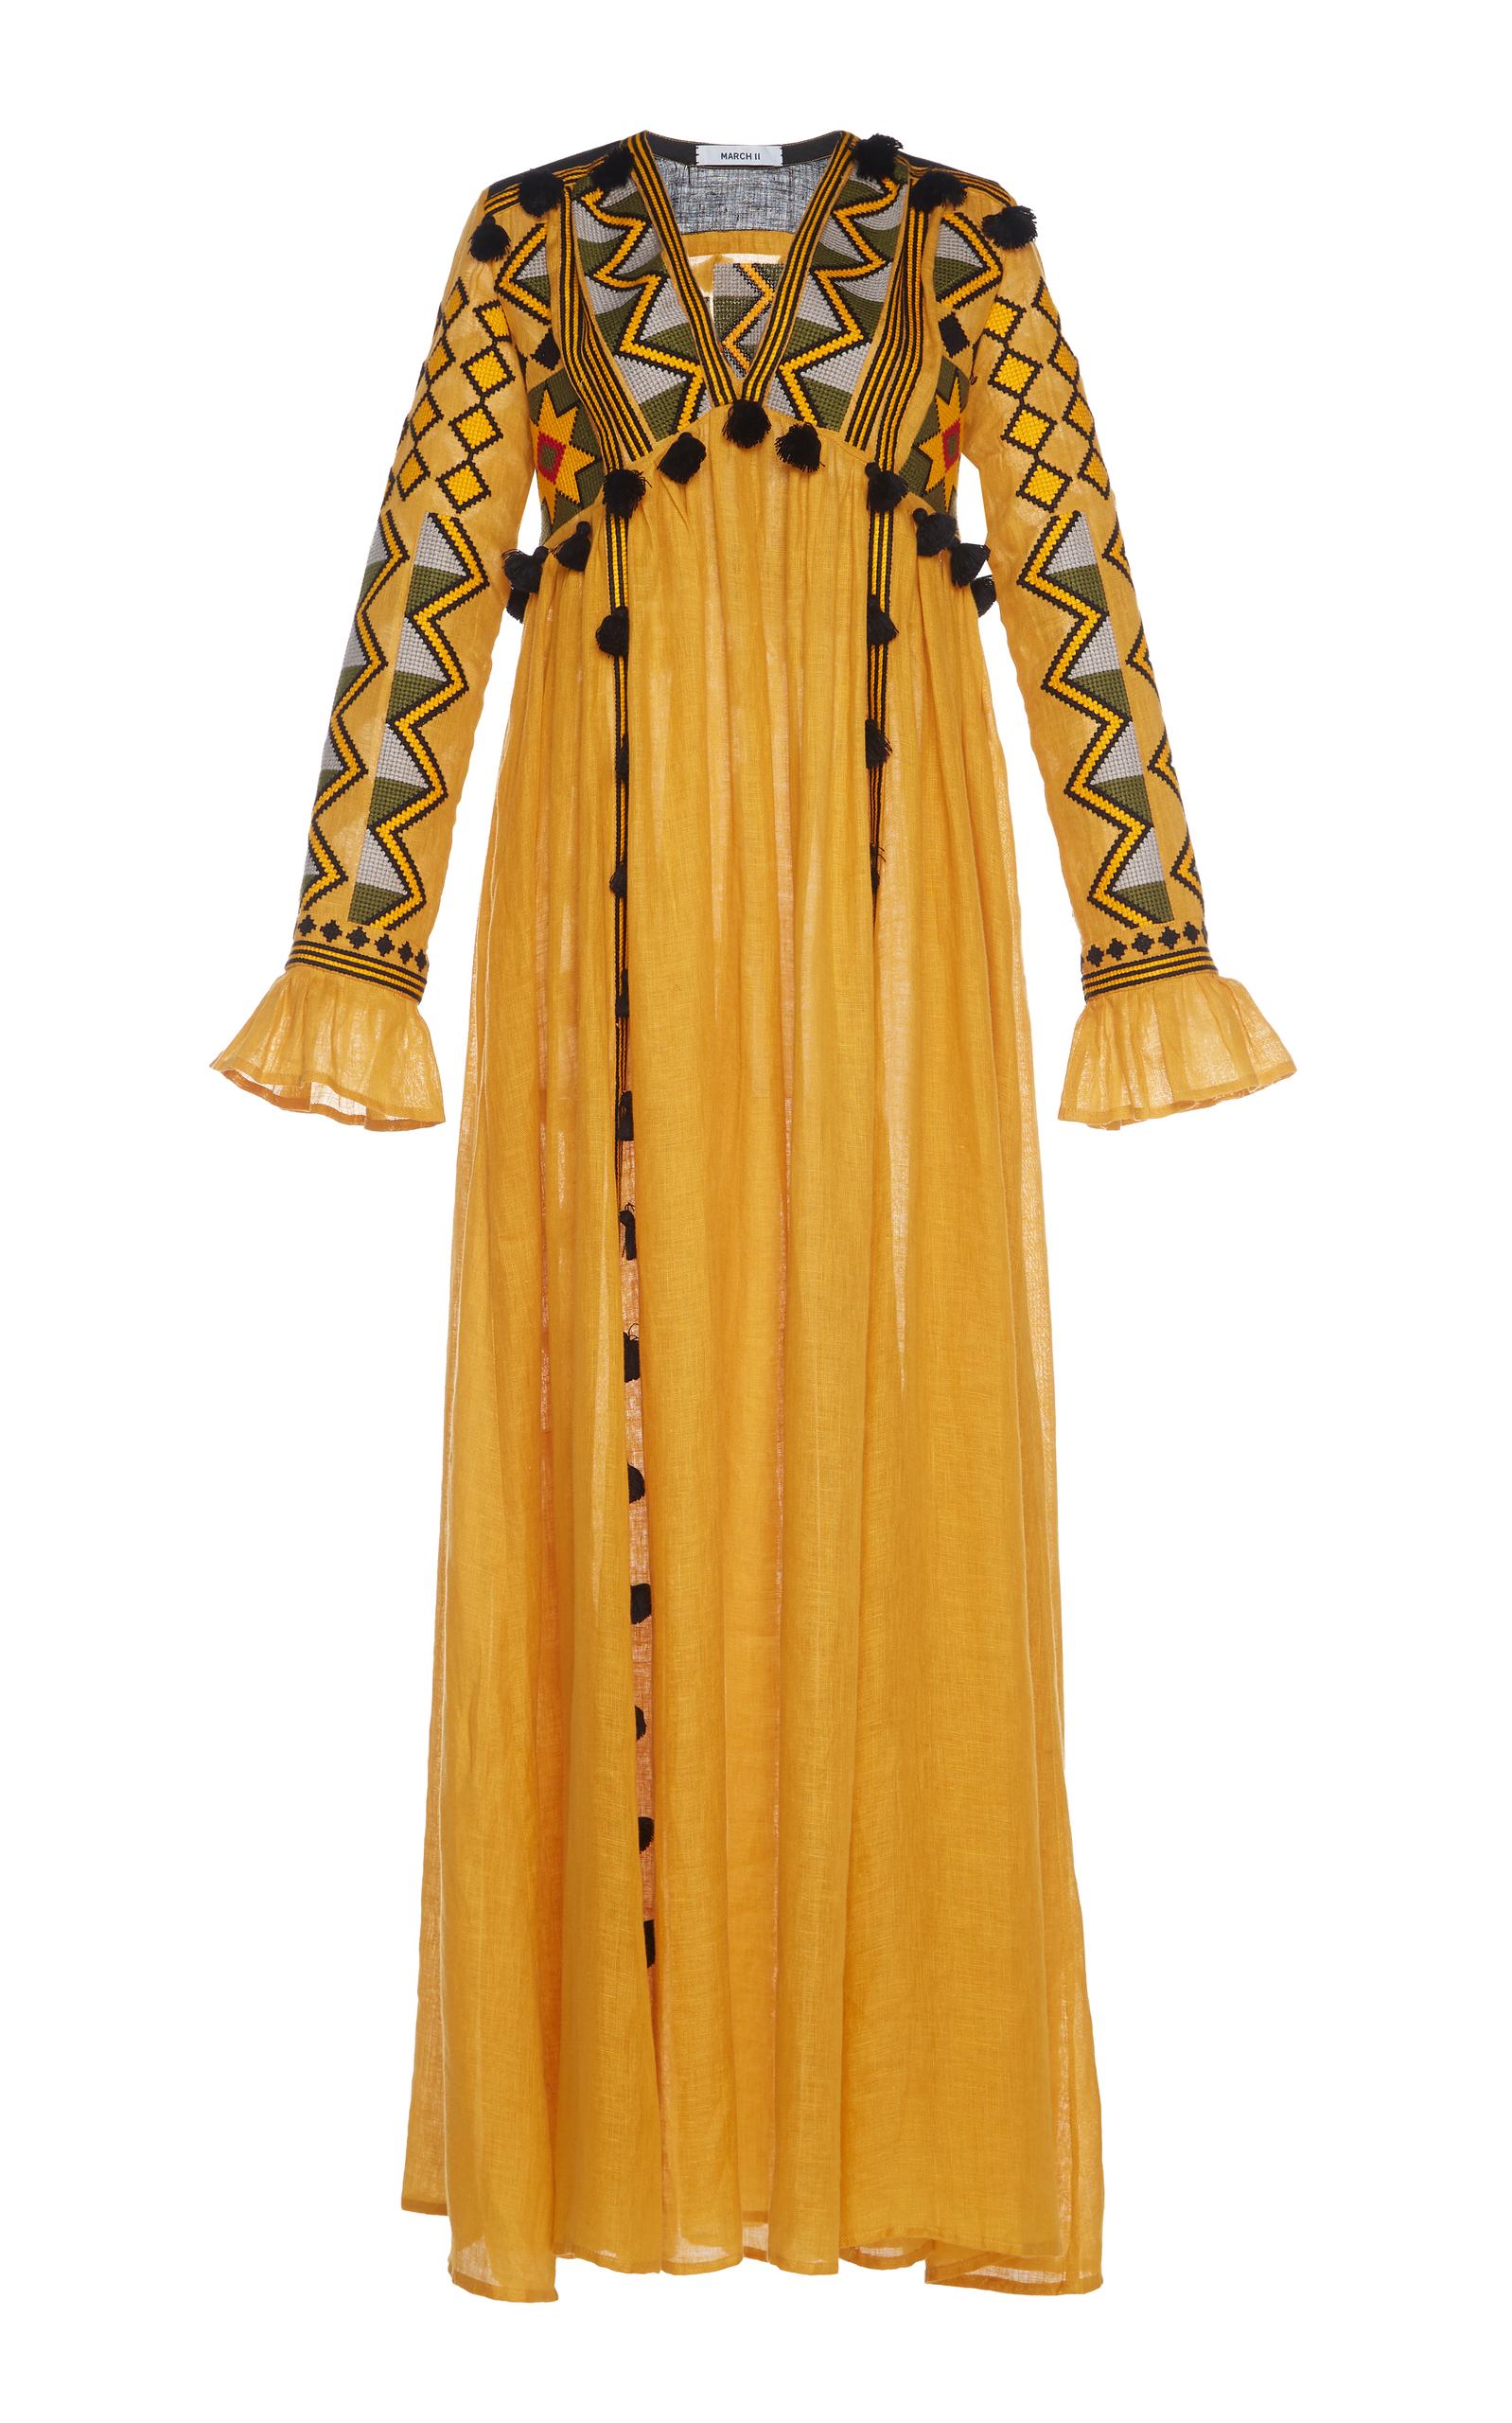 MARCH11 Kim Maxi Dress in Yellow